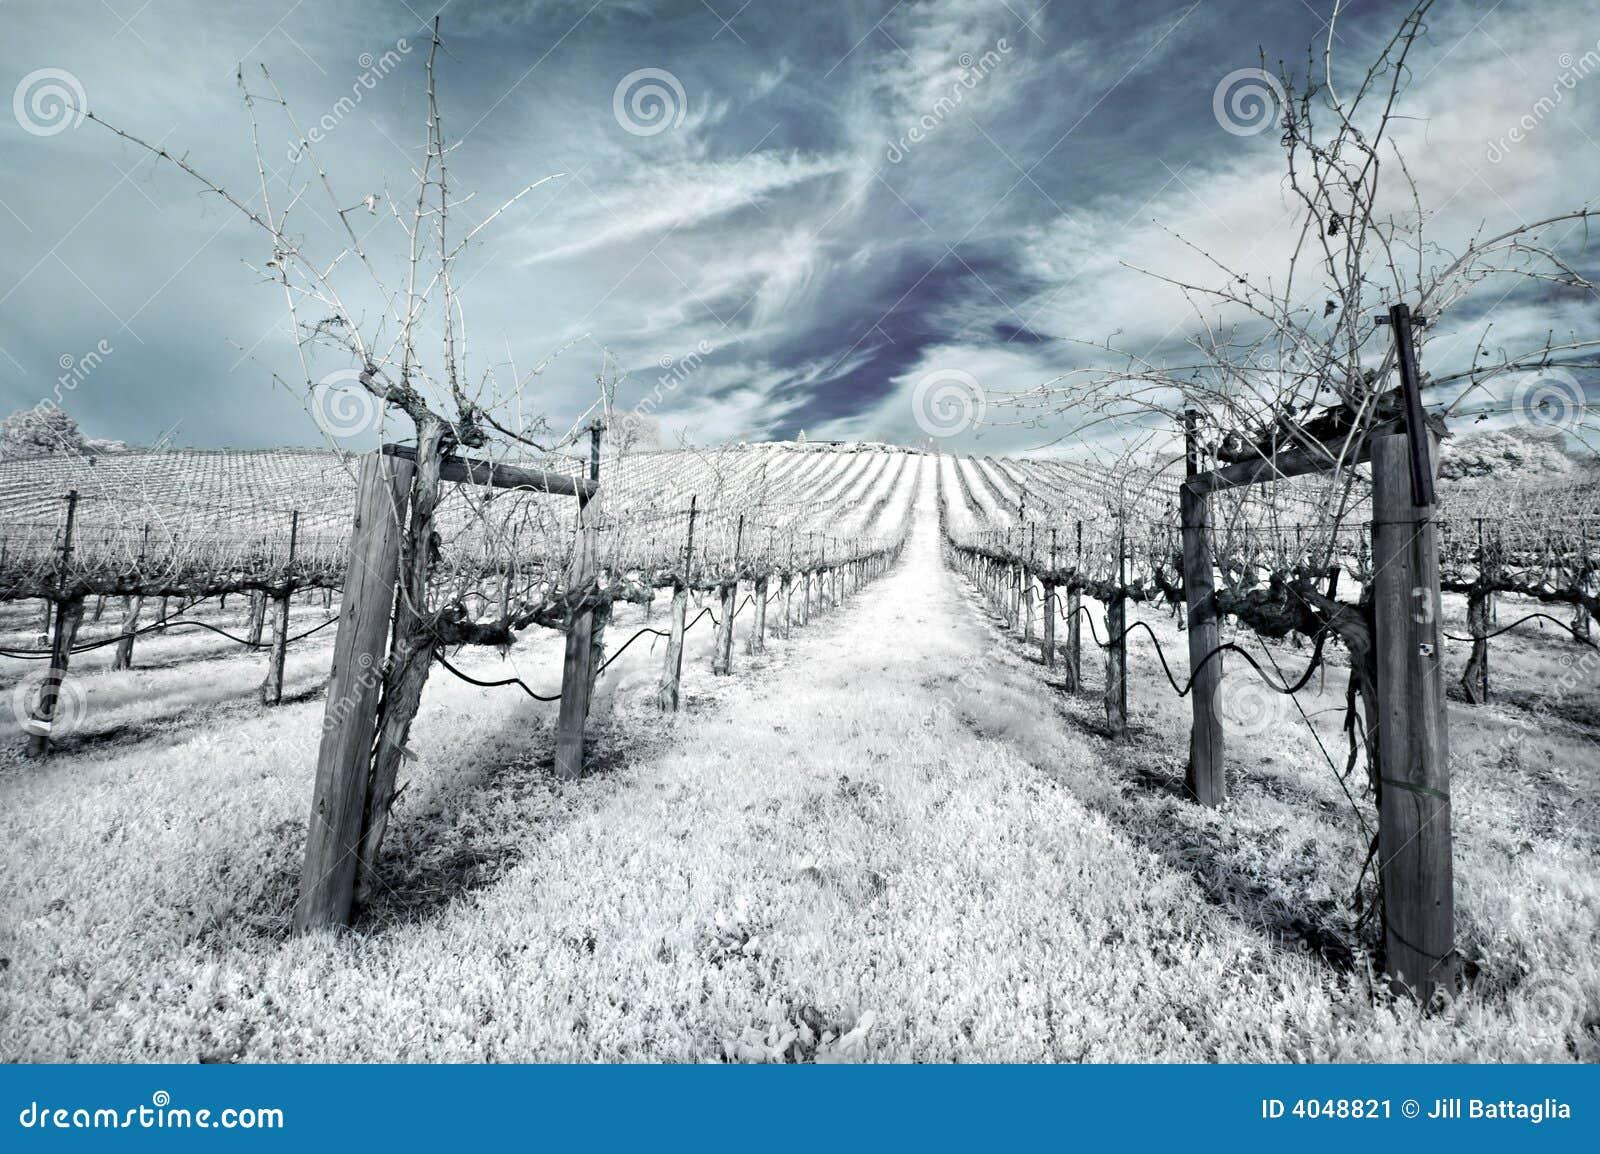 Winter Vineyard in Infrared